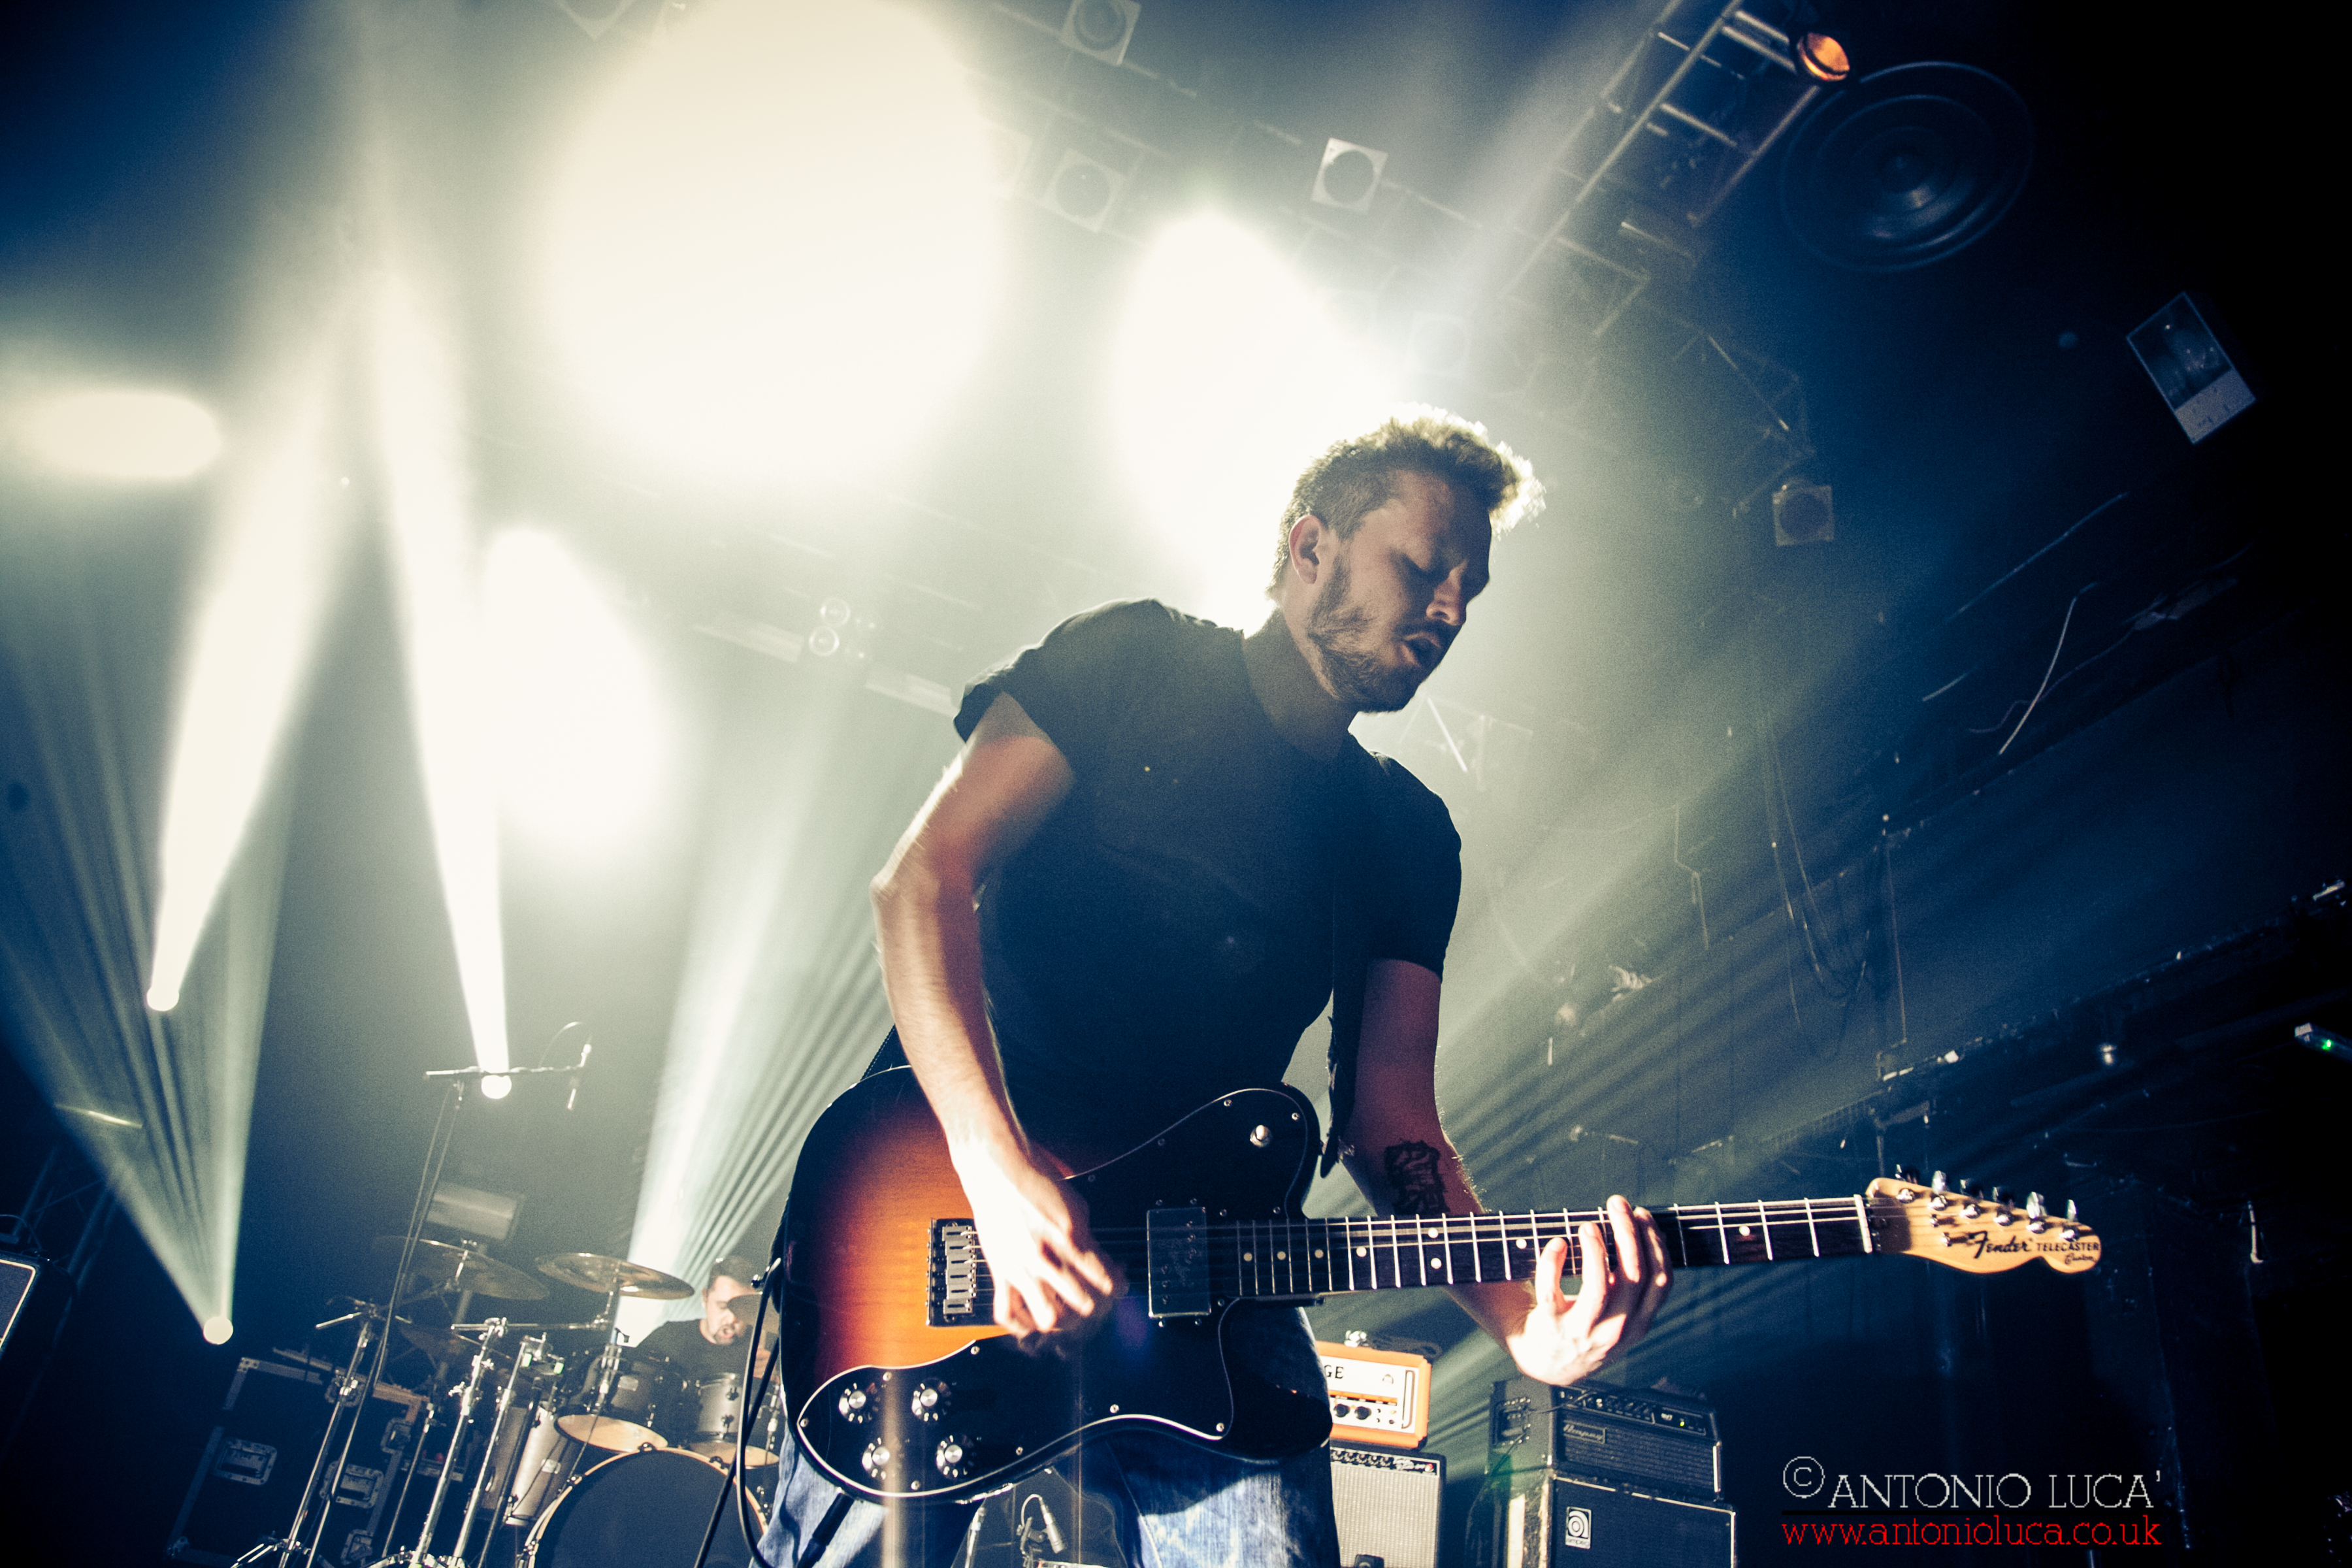 Photo Report: 65daysofstatic Live in London